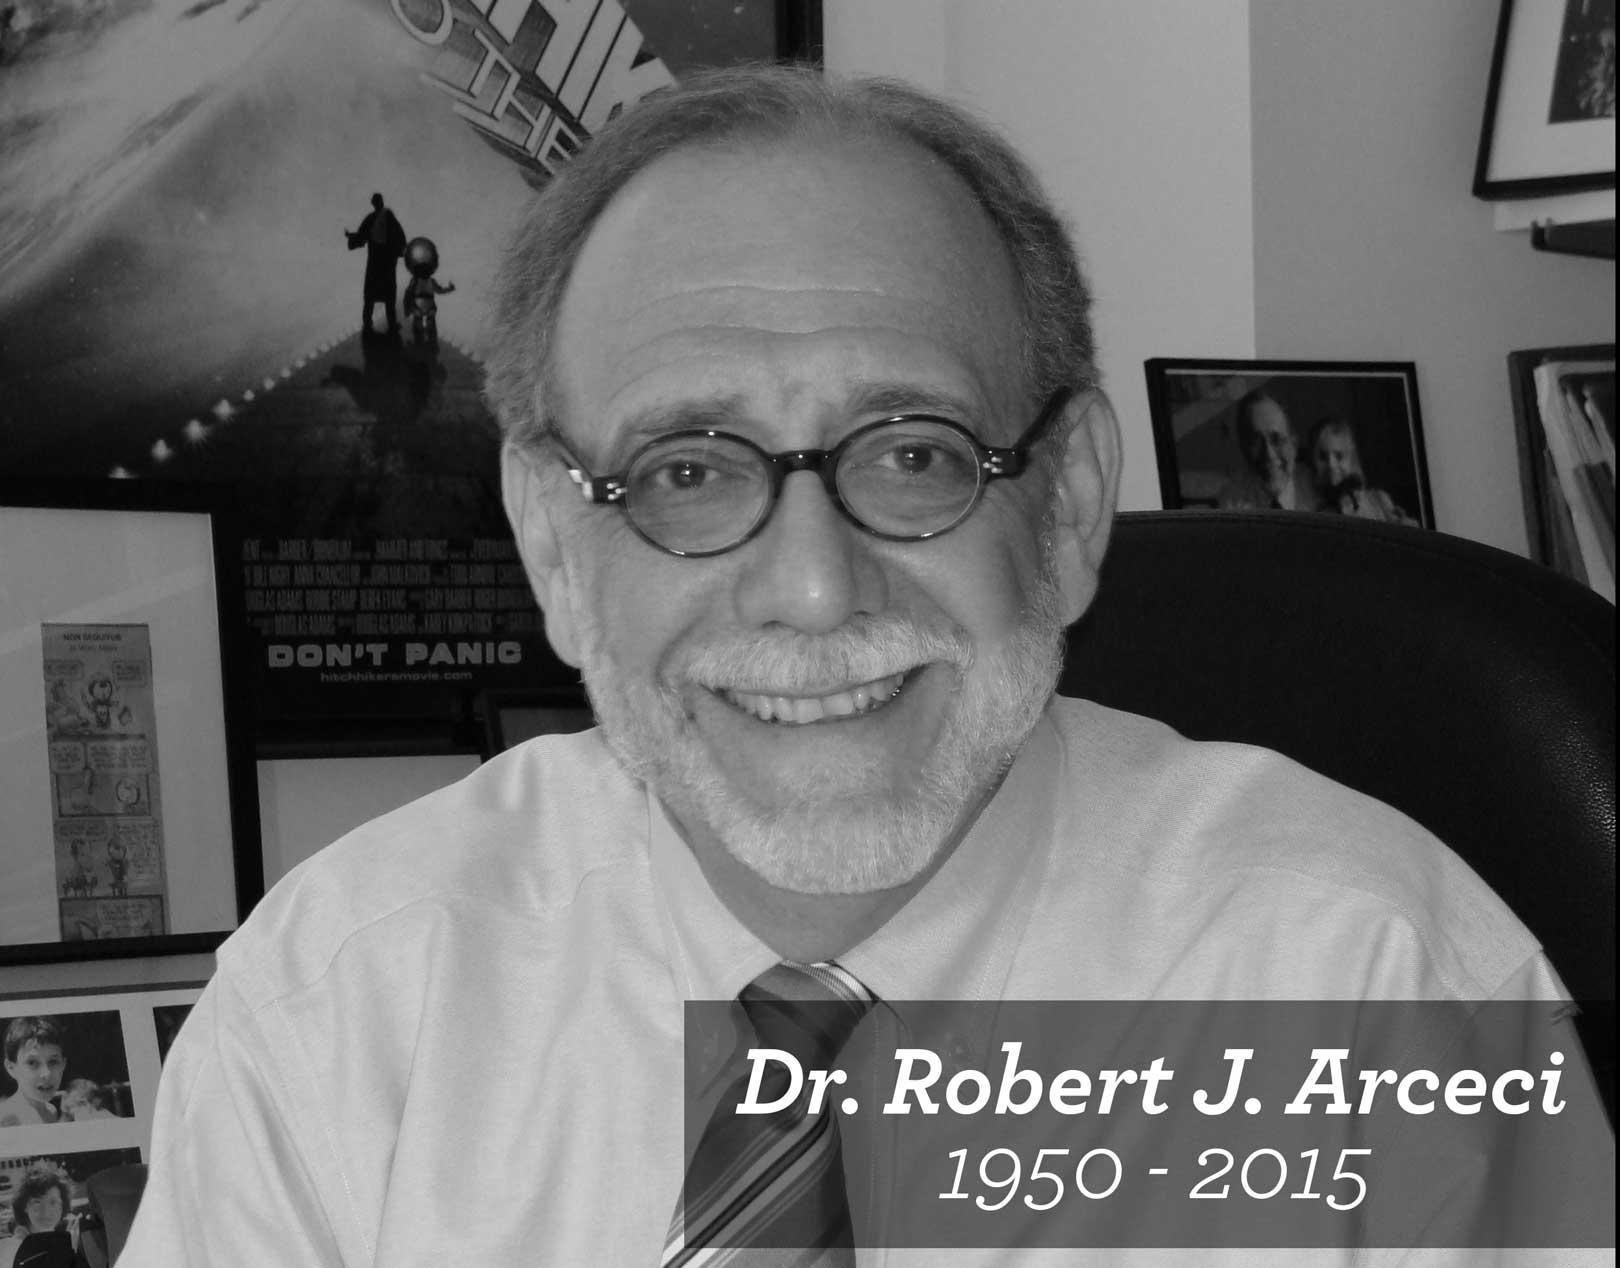 Dr. Robert Arceci